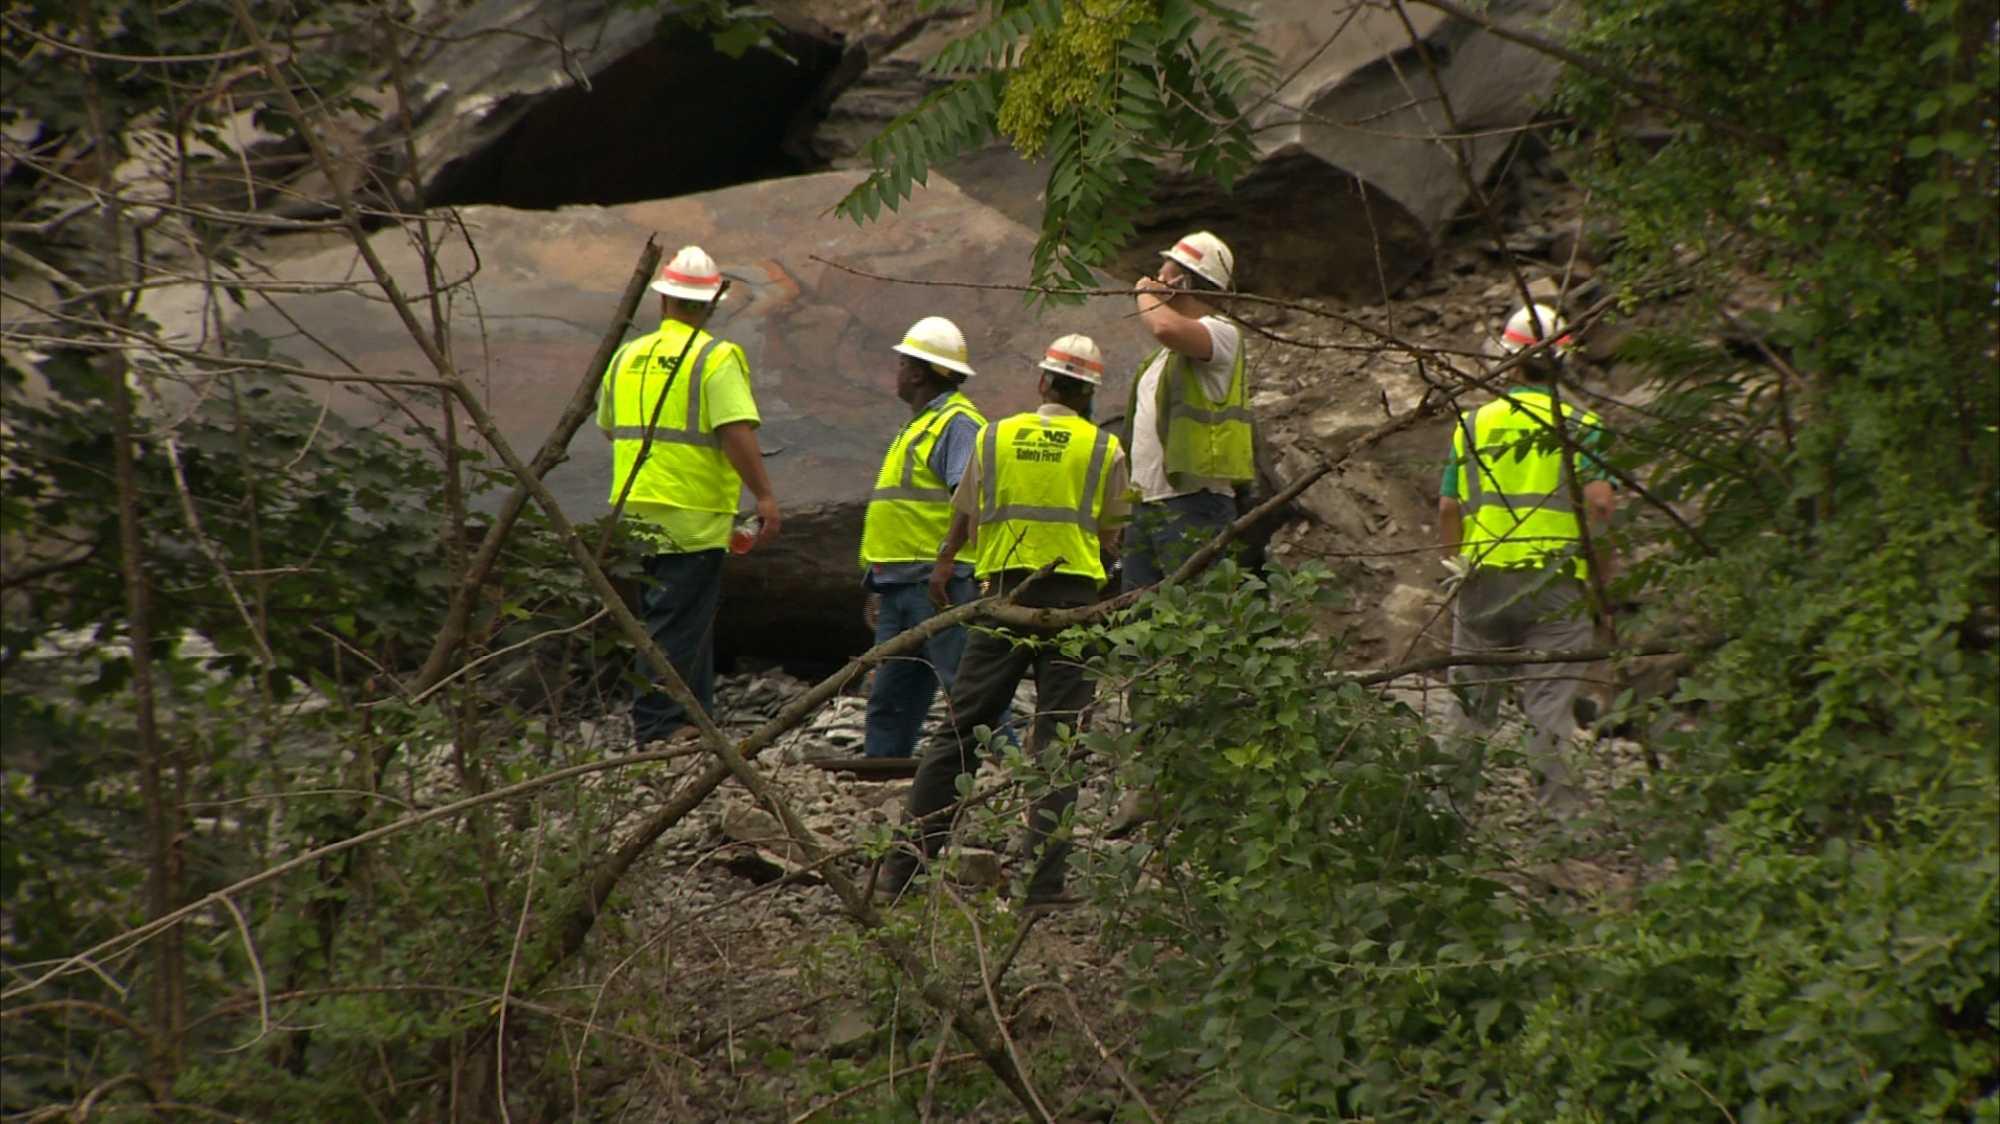 img-Landslide closes portion of West Carson Street